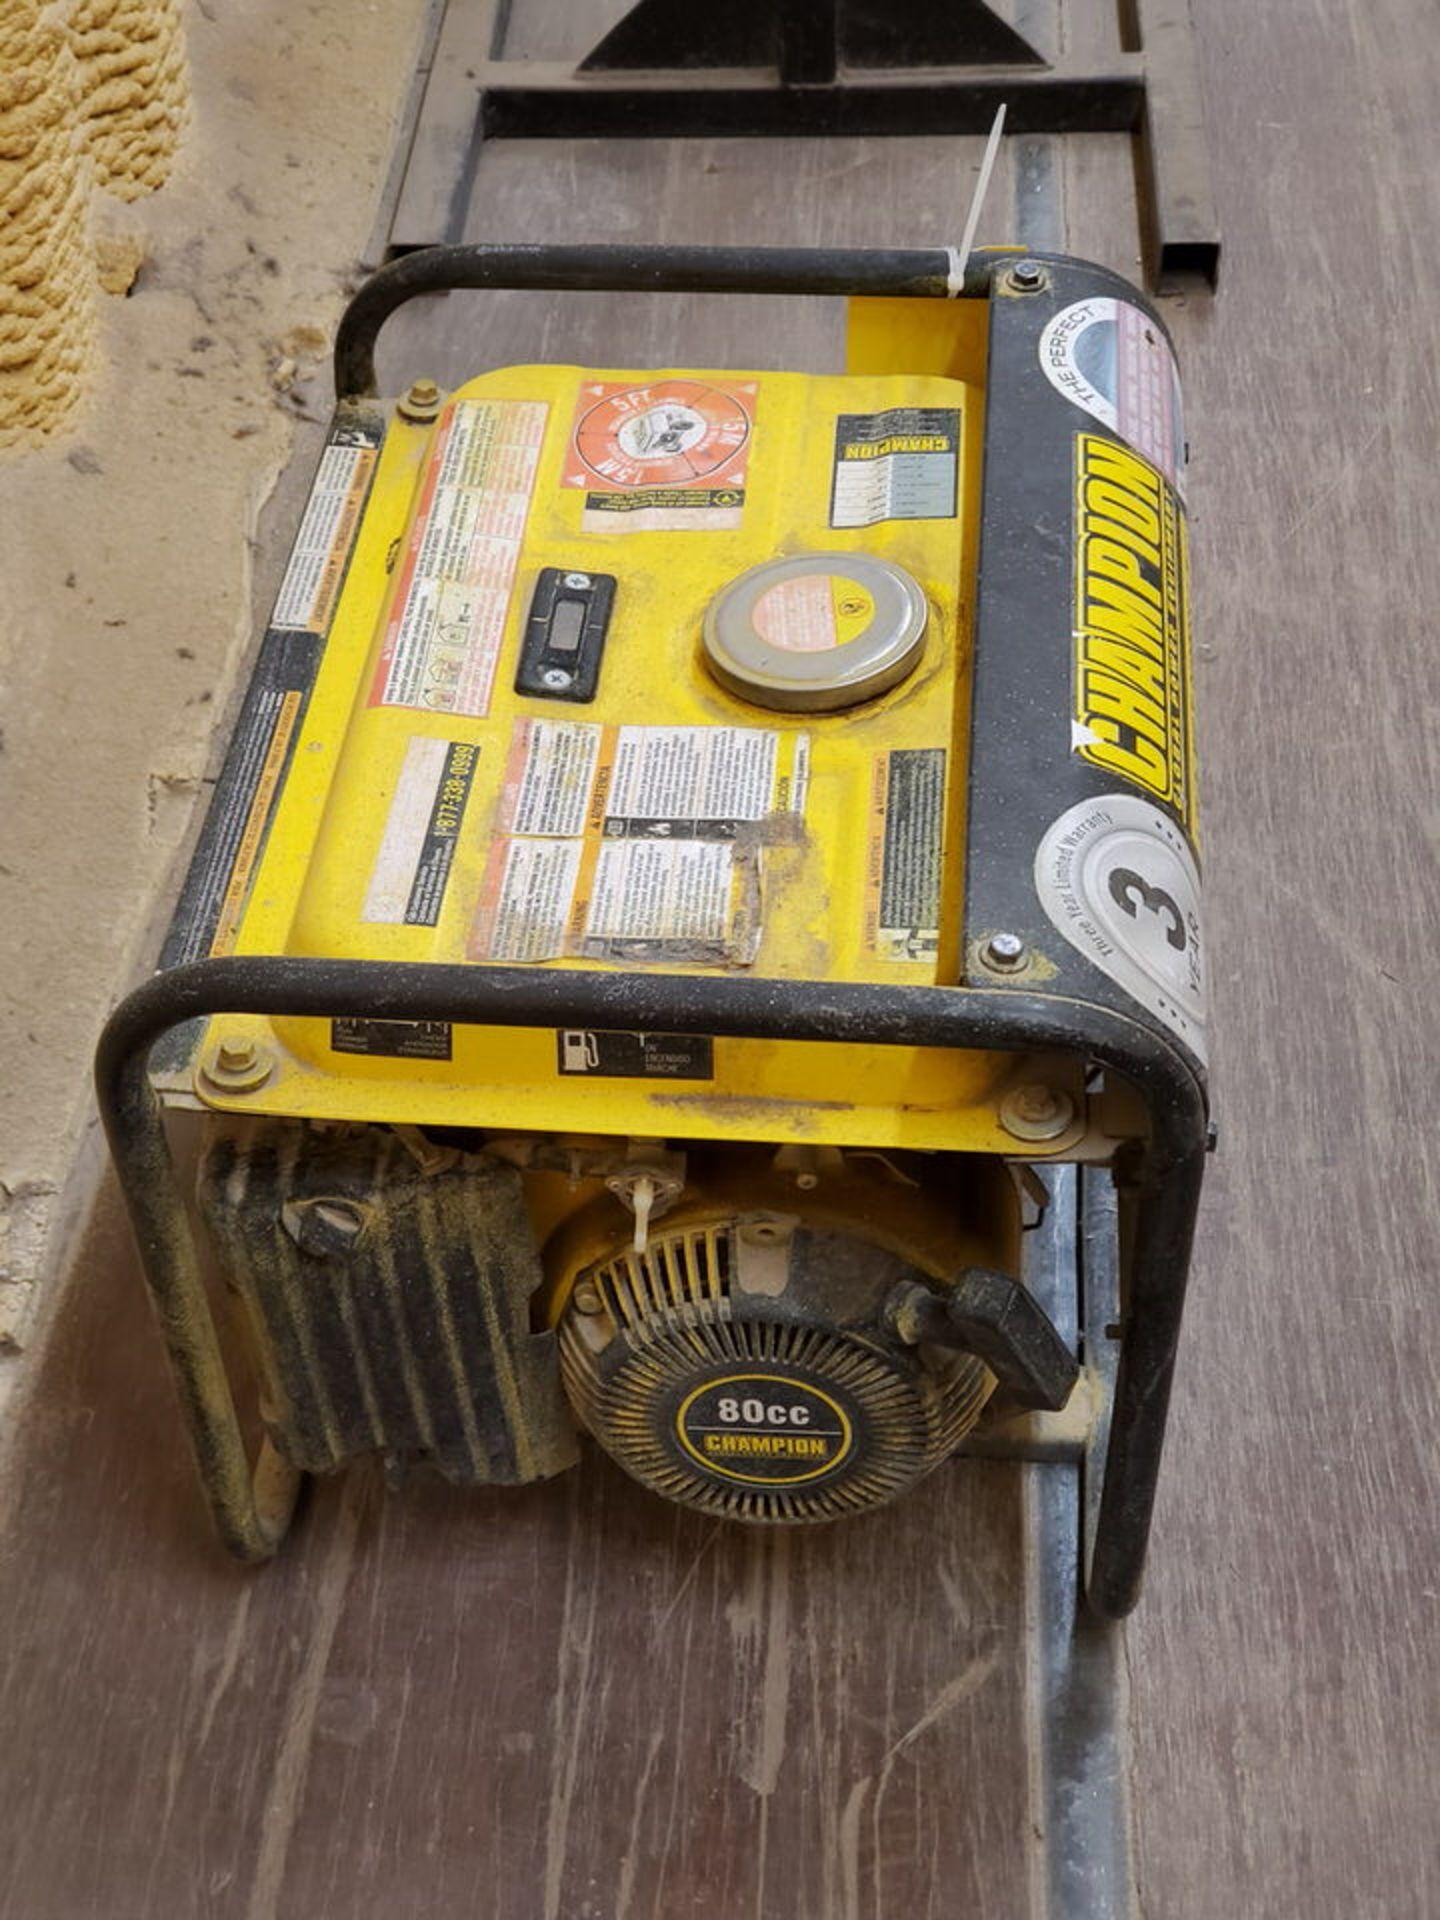 Champion 42432 Portable Generator 1400W, W/ 80cc Engine, 1PH, 60HZ, 120V, 11.7A - Image 3 of 7